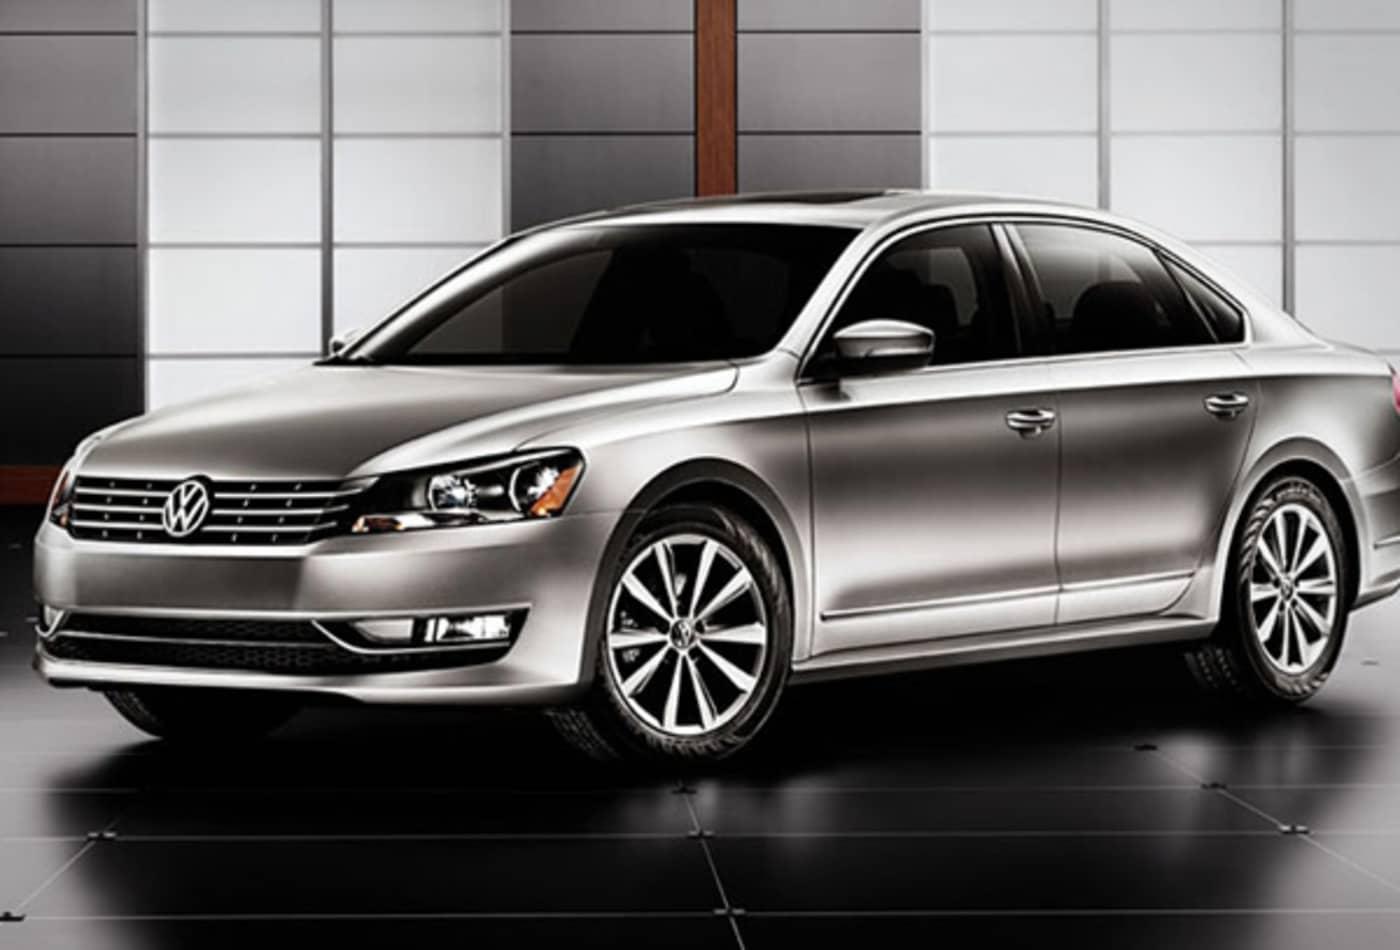 Volkswagon-Passat-Best-Cars-Commuting-CNBC.jpg